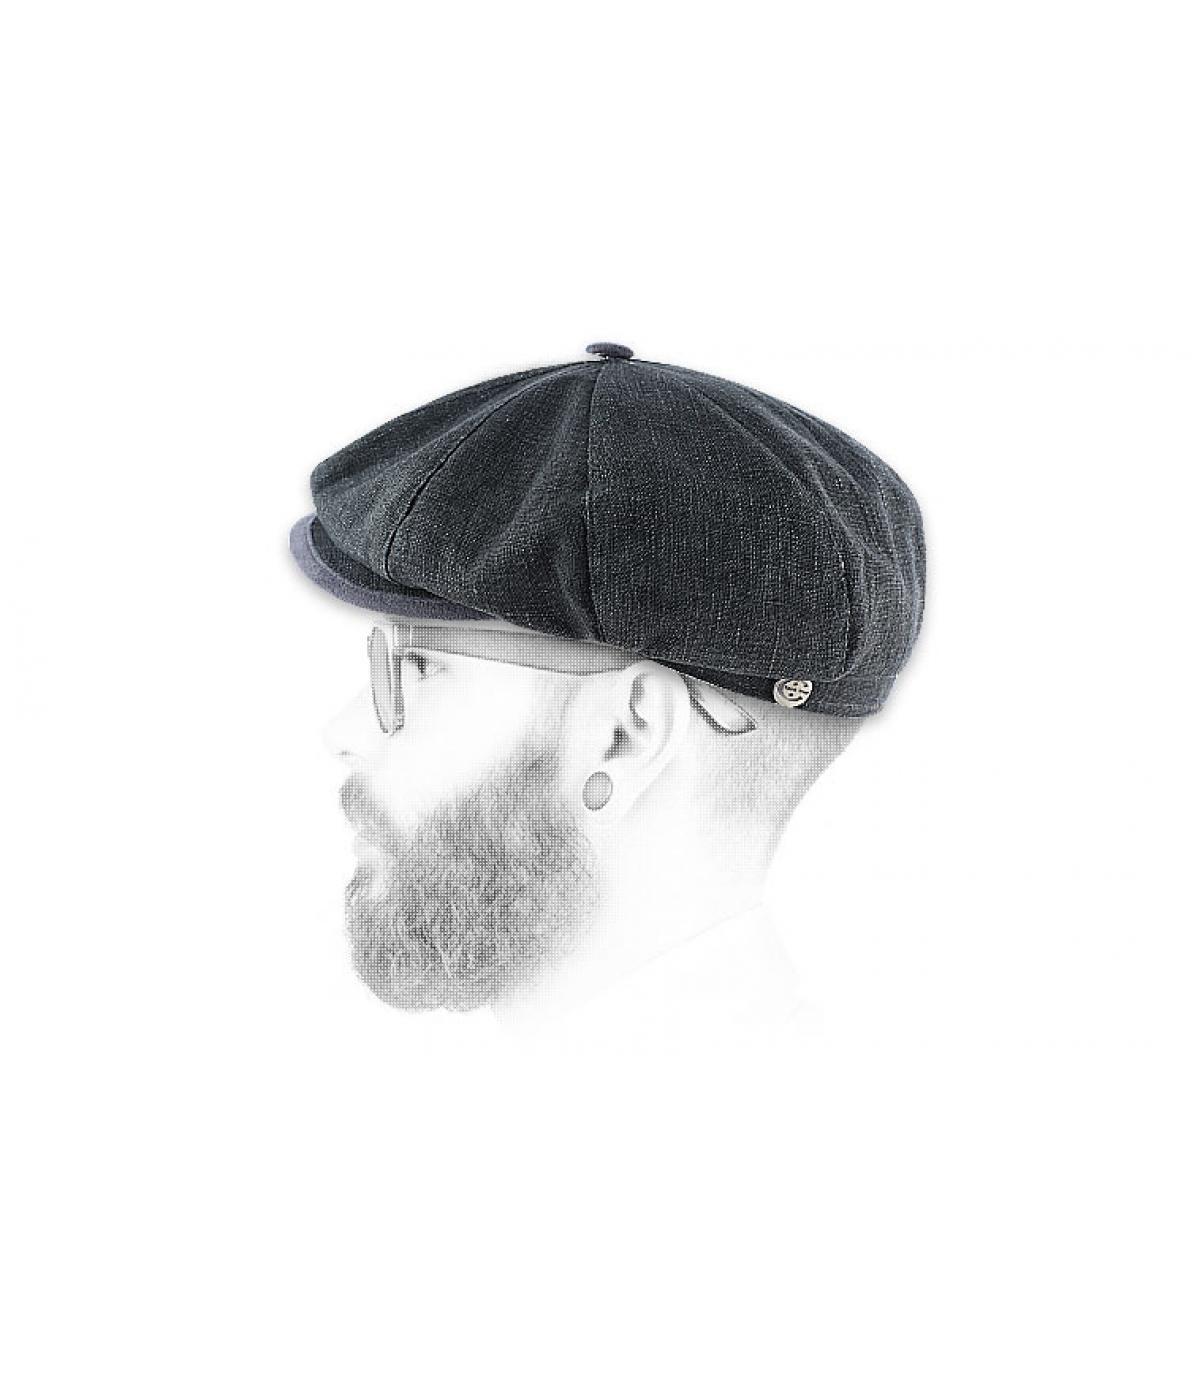 Casquette gavroche gris homme